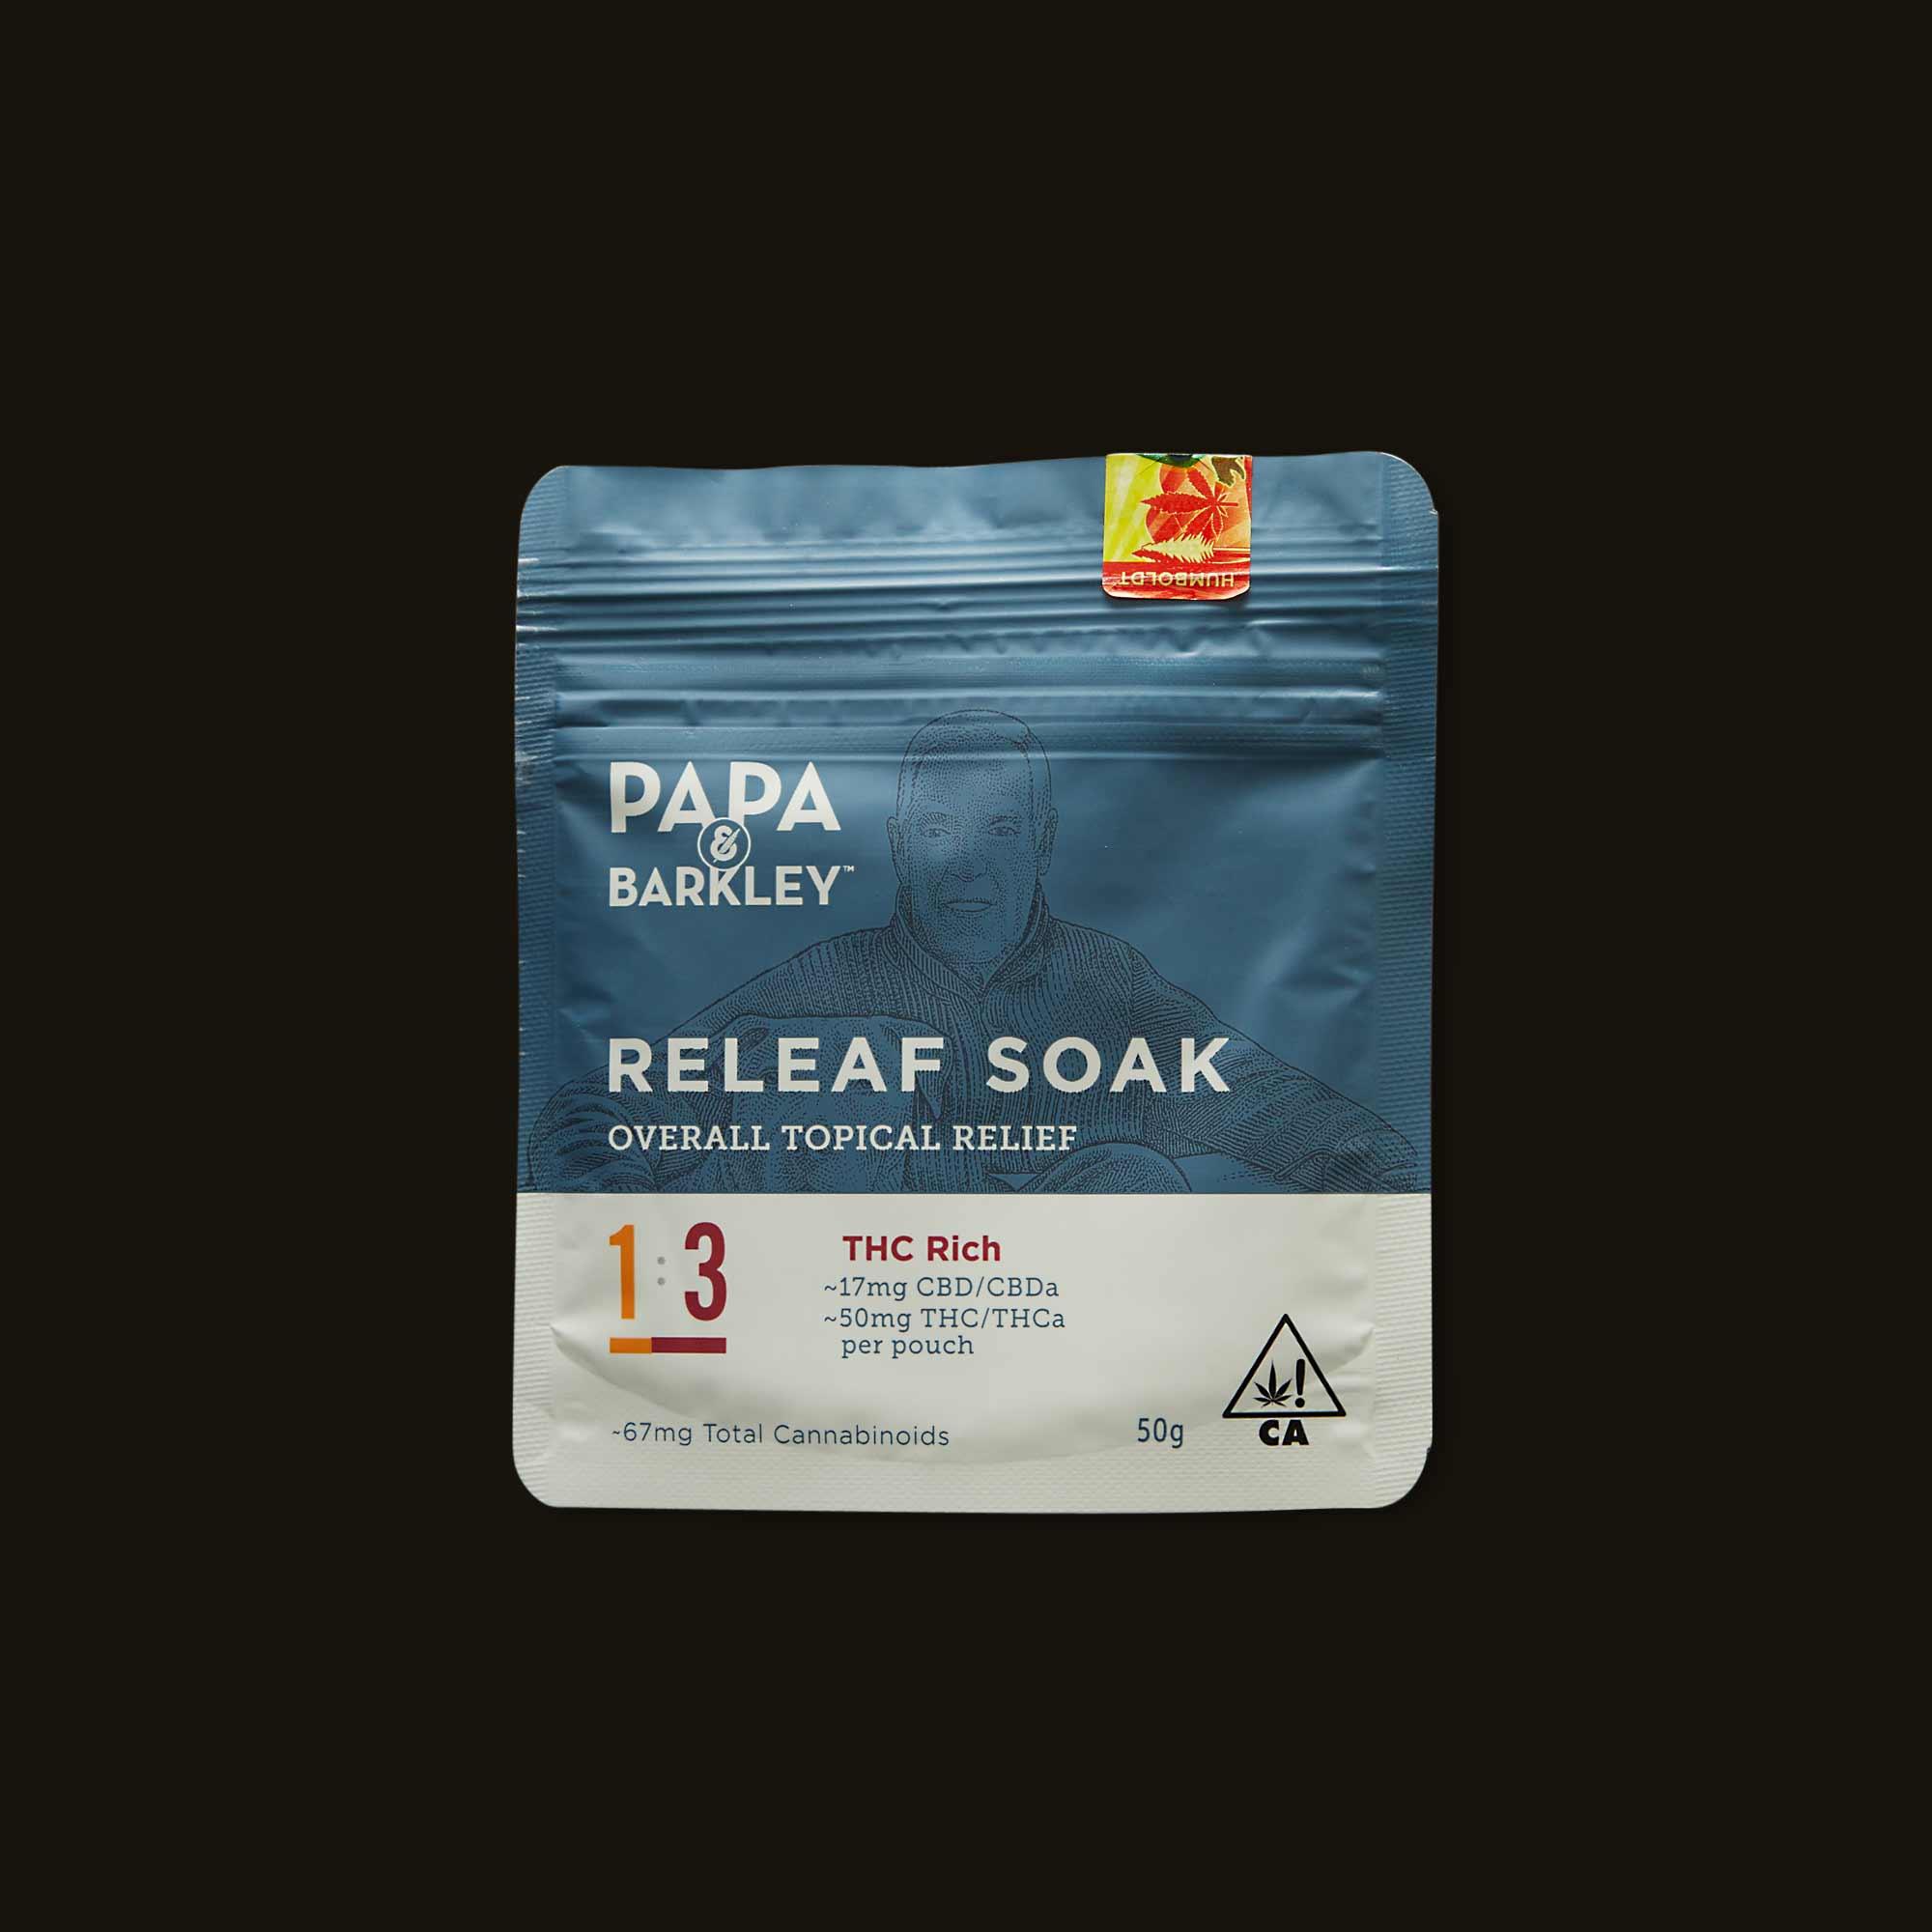 Papa & Barkley 1:3 CBD:THC Releaf Soak